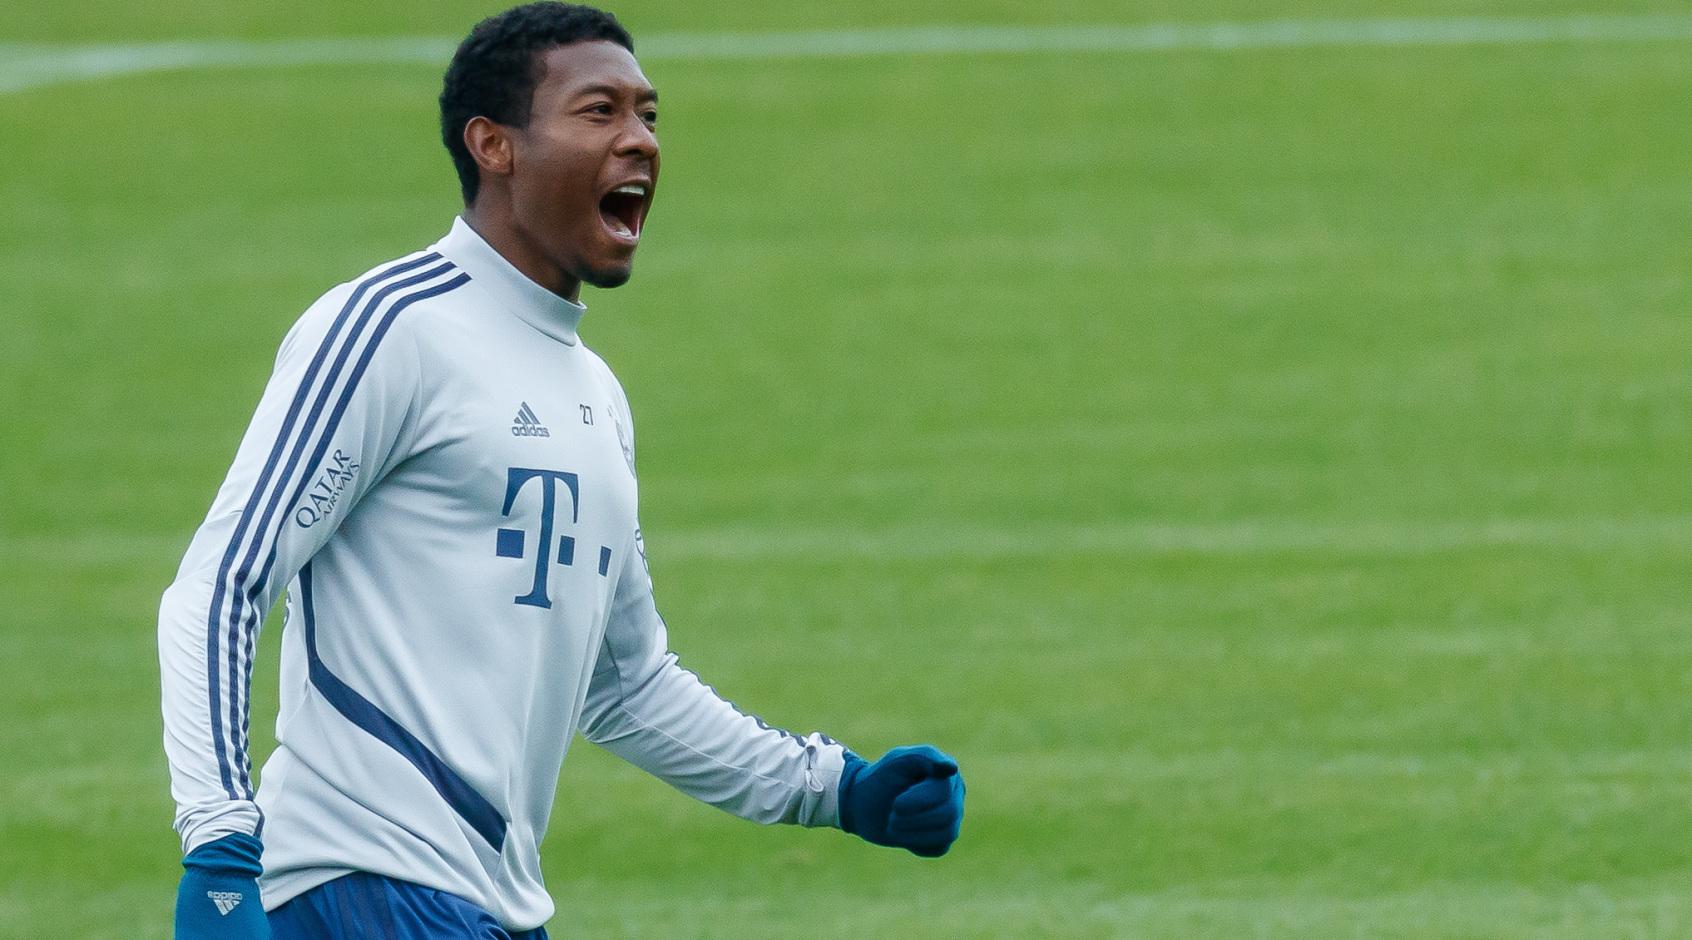 """Бавария"" готова предложить Давиду Алабе контракт на 15 миллионов евро"